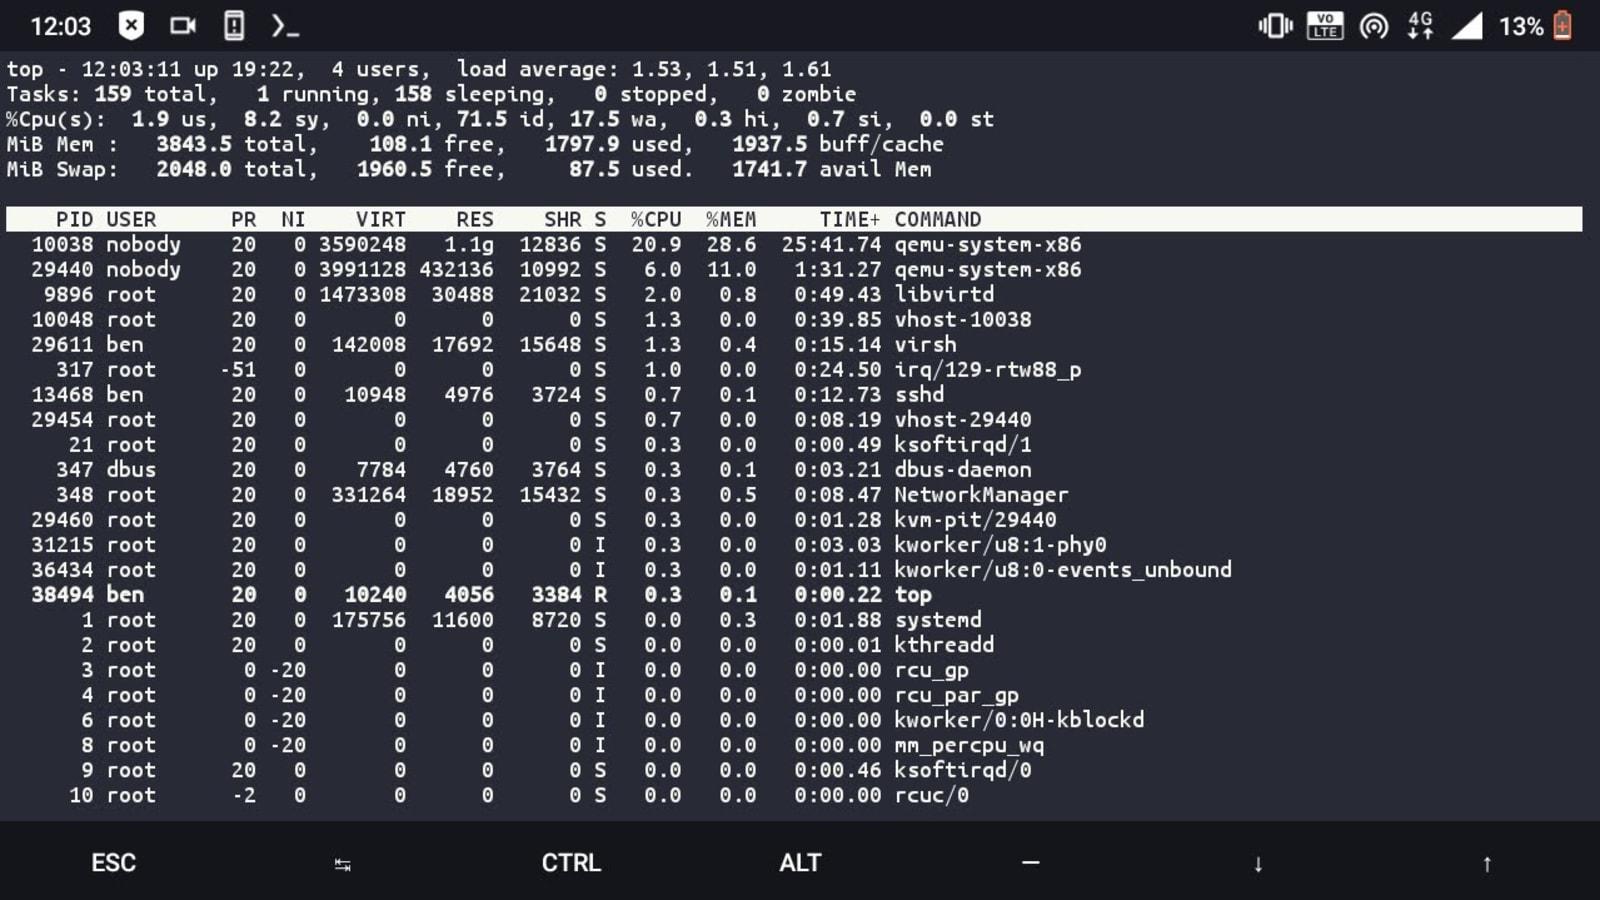 vds vps виртуальные выделенные серверы